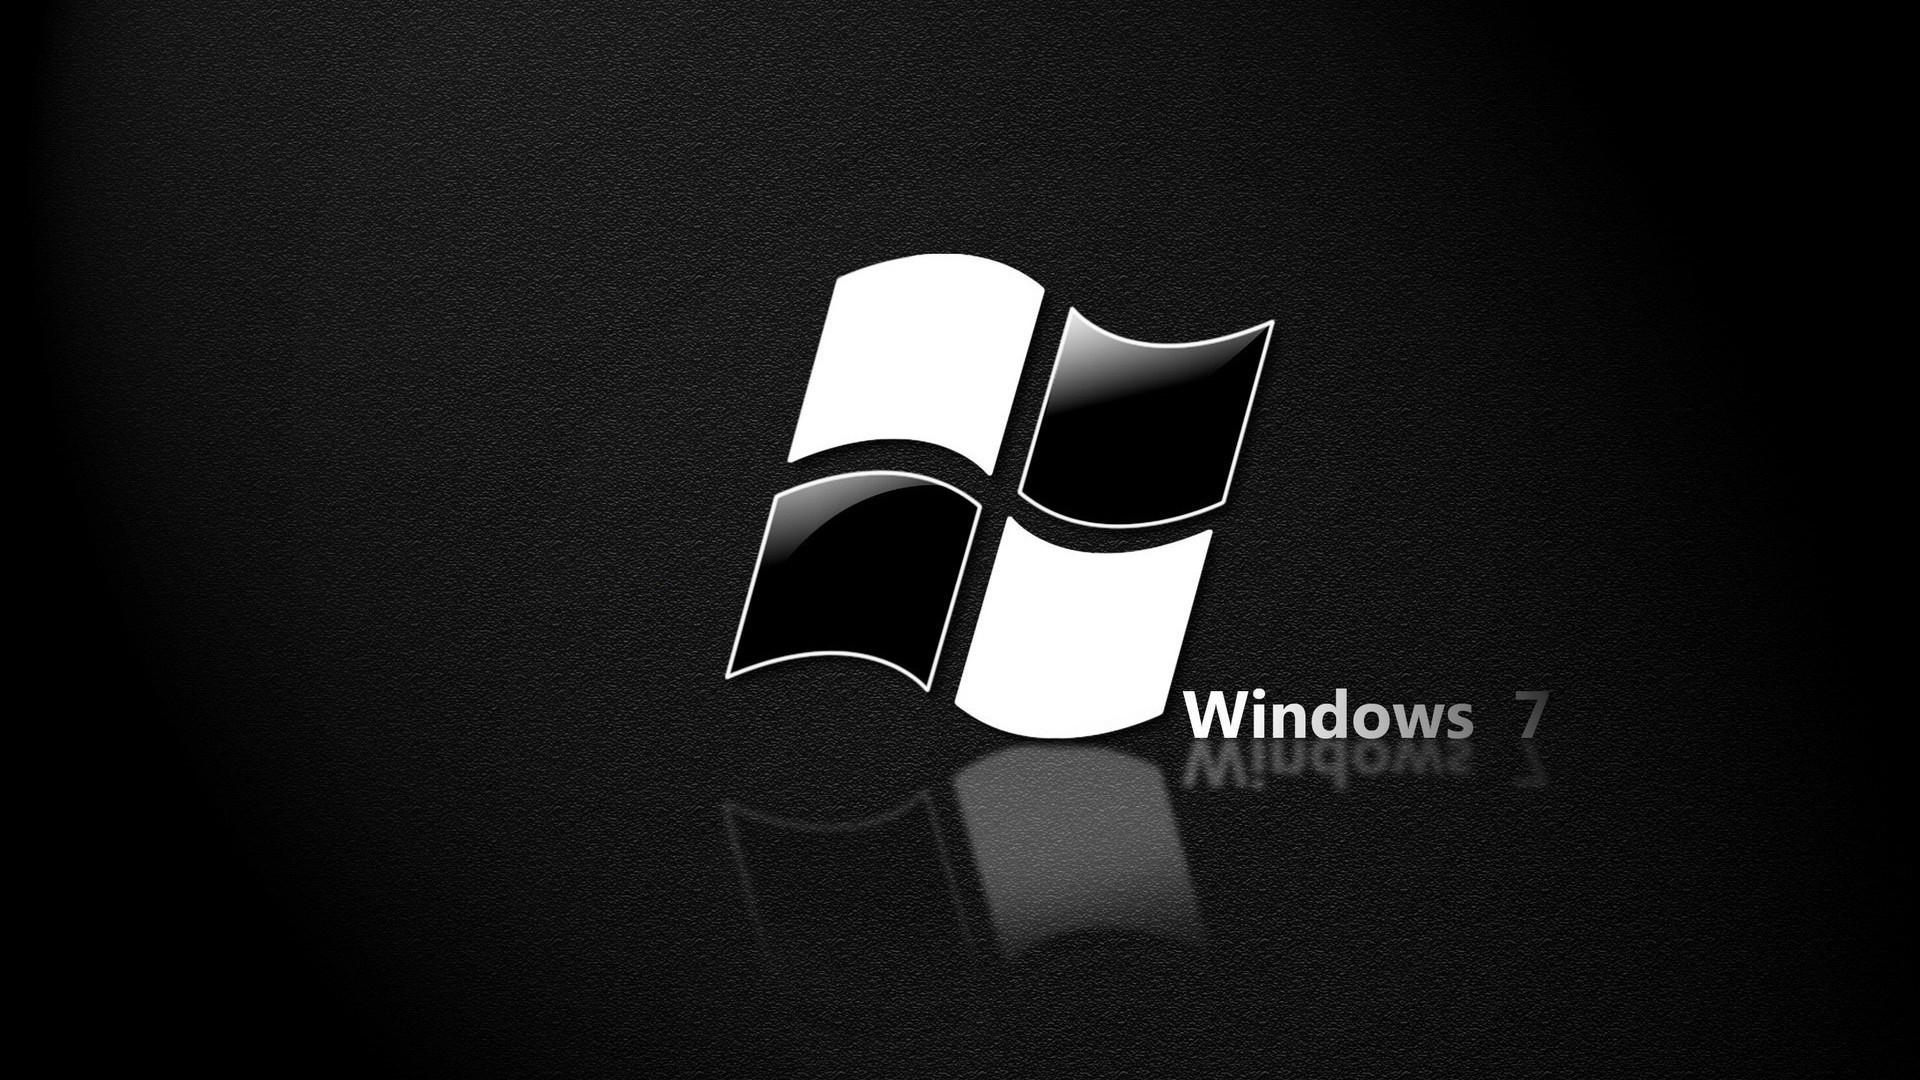 Res: 1920x1080, Windows 7 Black High Resolution Wallpaper : Brands Wallpaper .